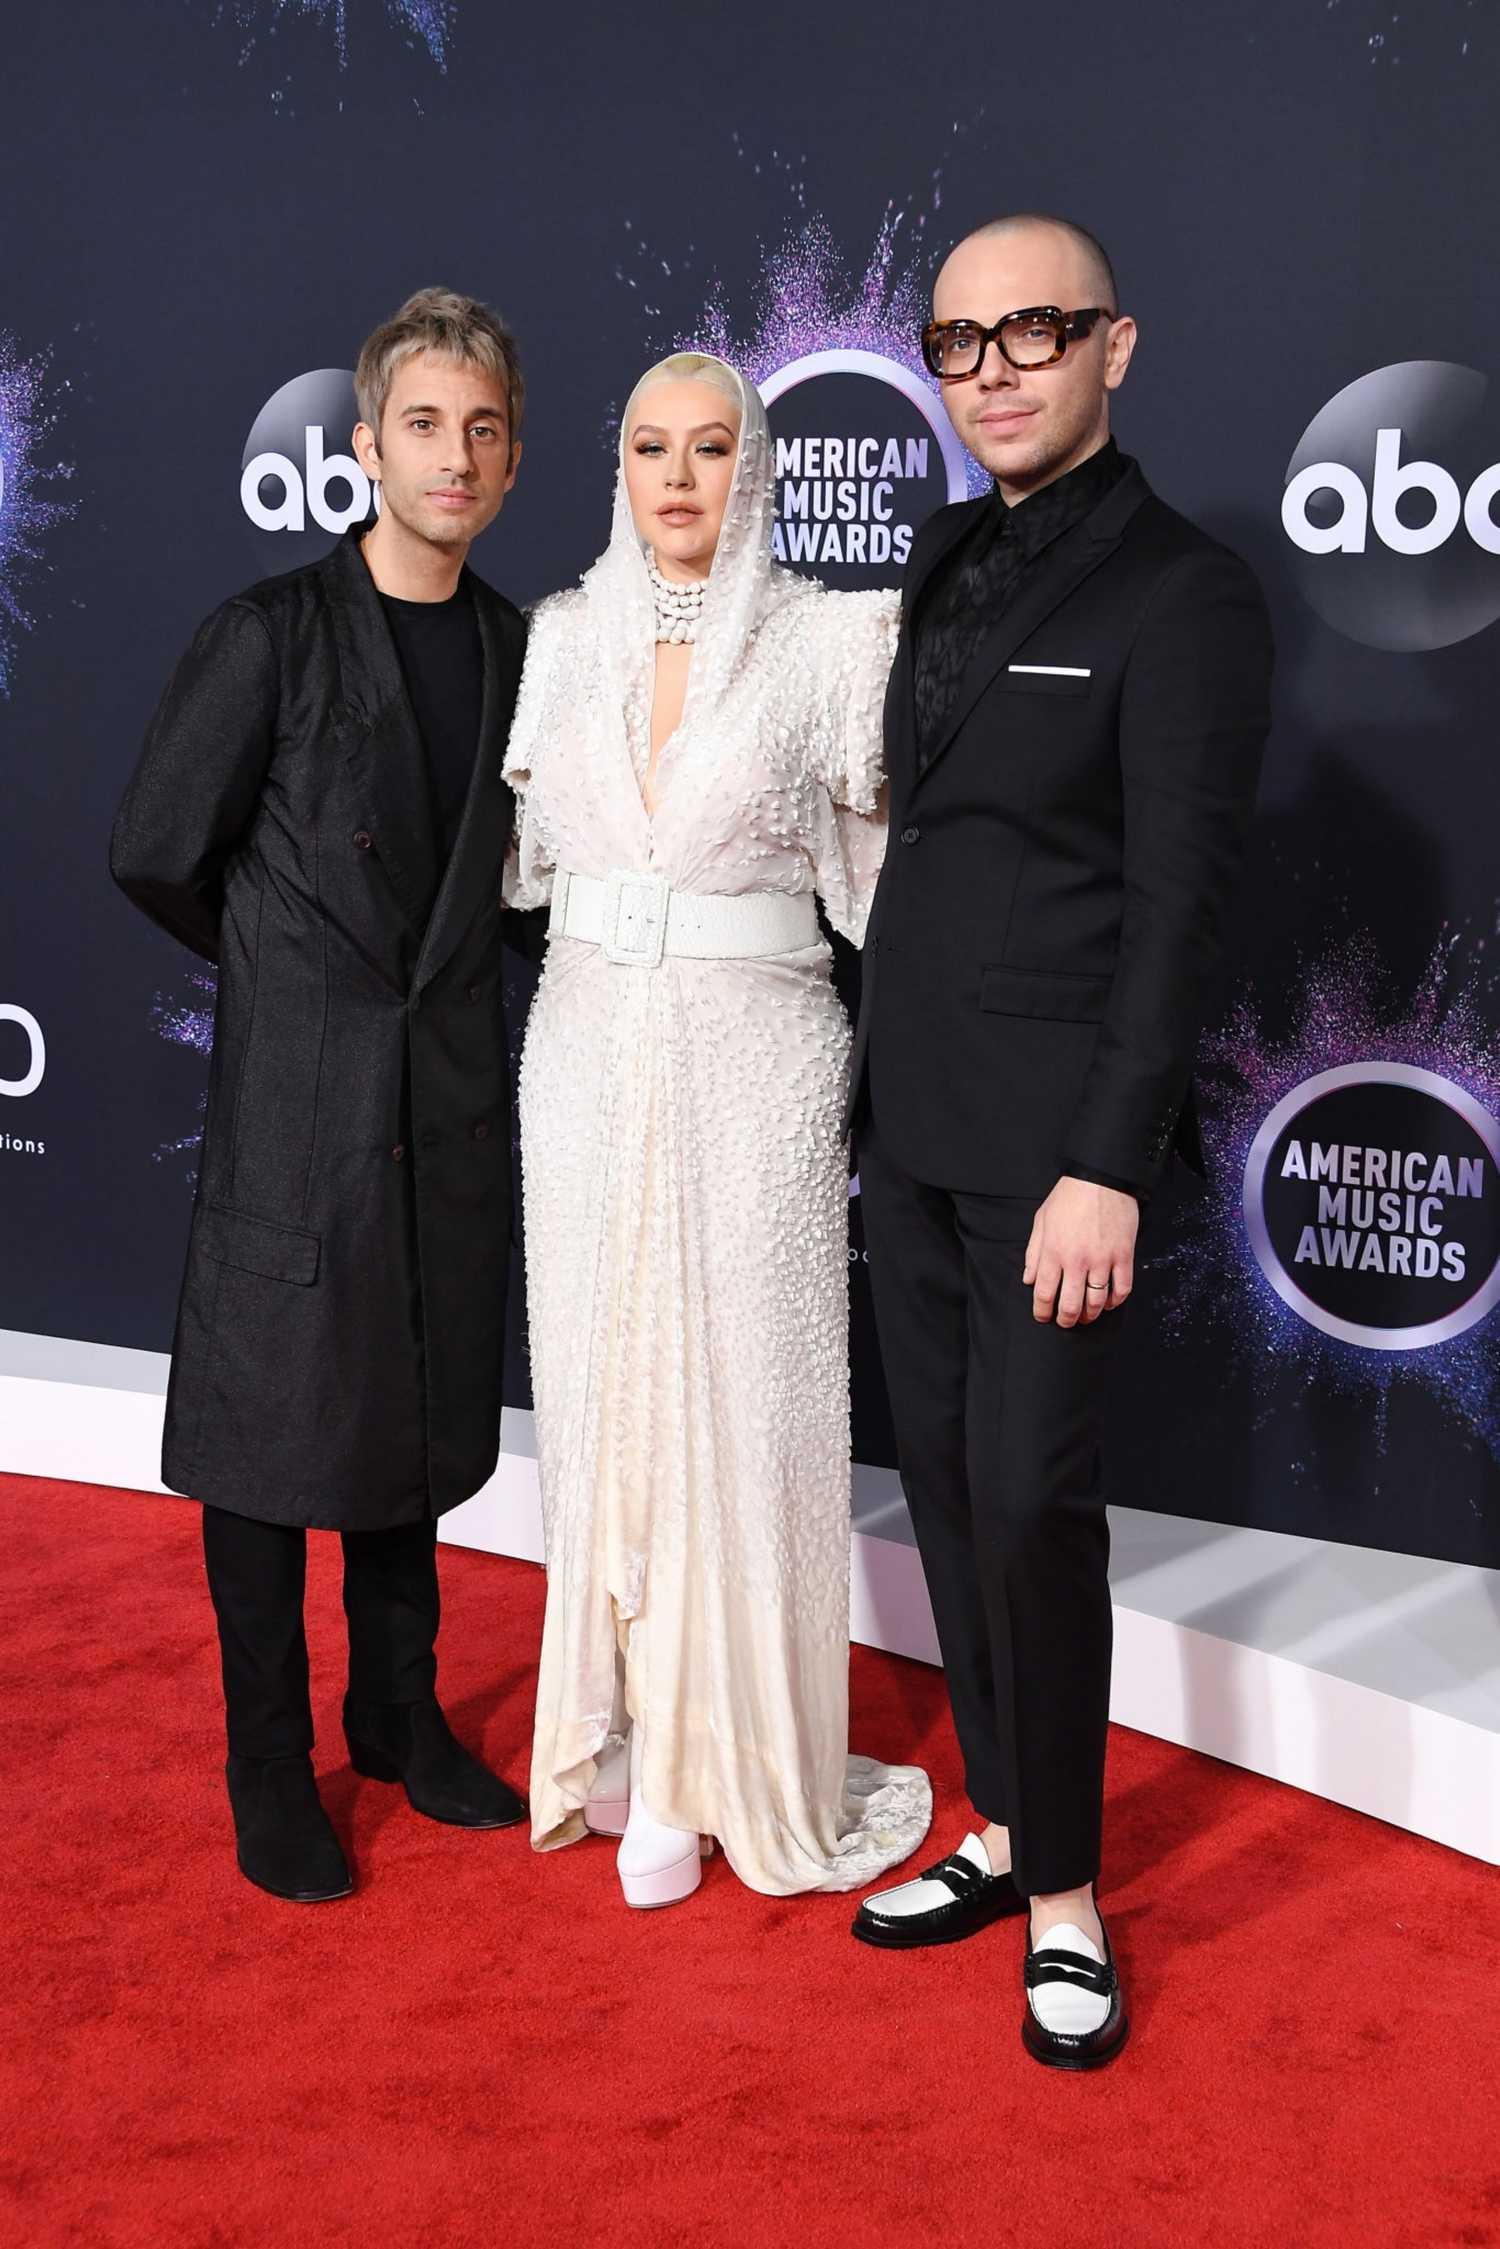 Christina_Aguilera_-_2019_American_Music